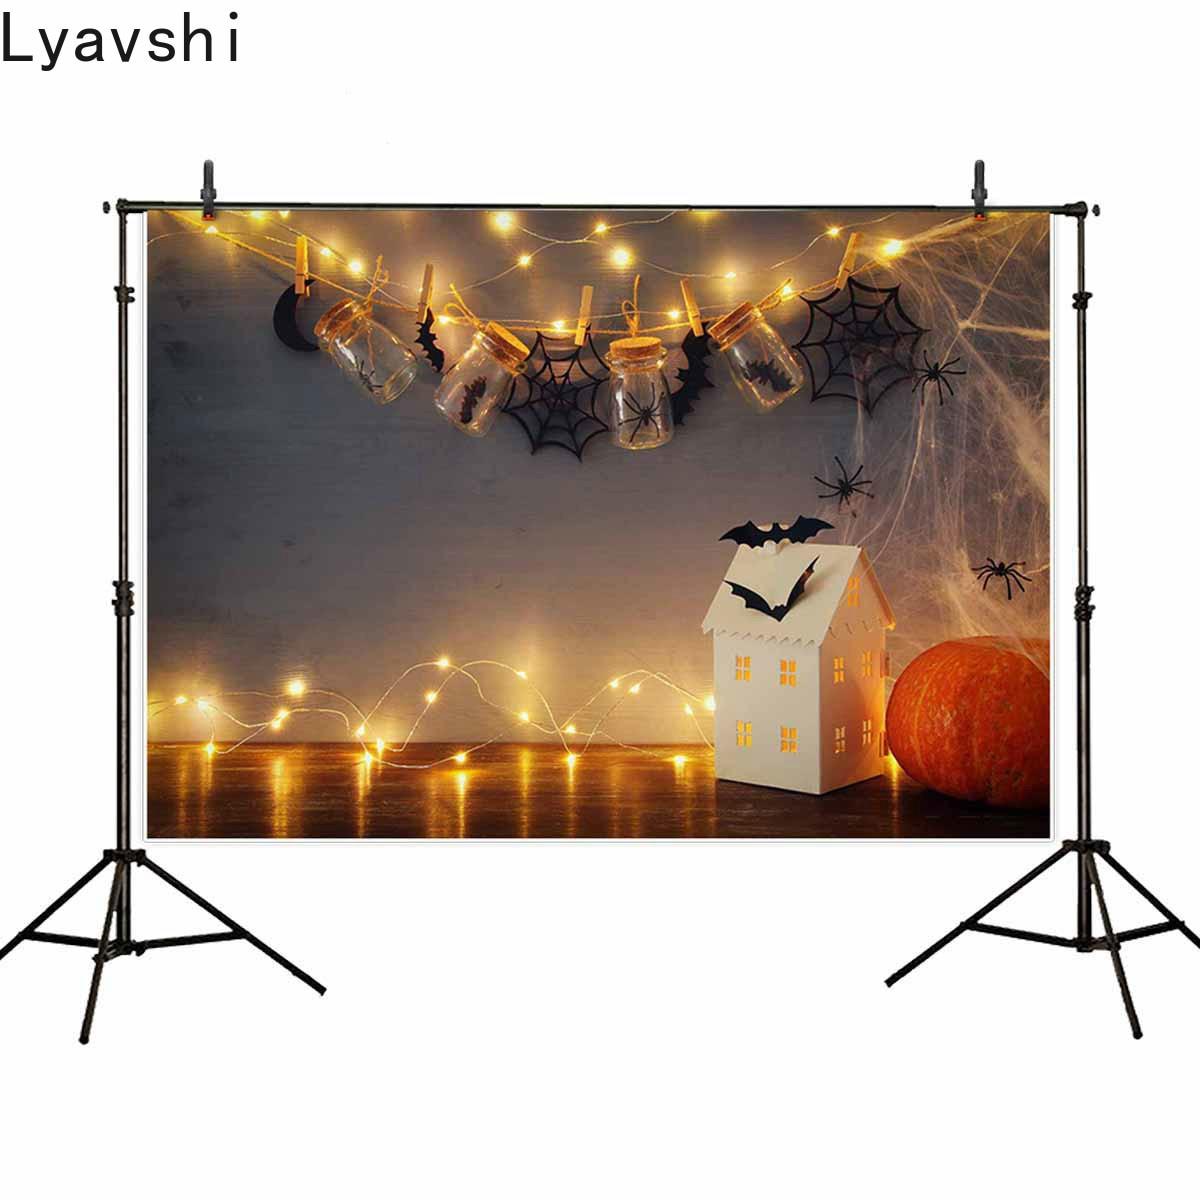 Pano de Fundo para Estúdio Lyavshi Halloween Fotográfico Casa Misteriosa Mason Jarros Aranha Web Morcegos Fundo